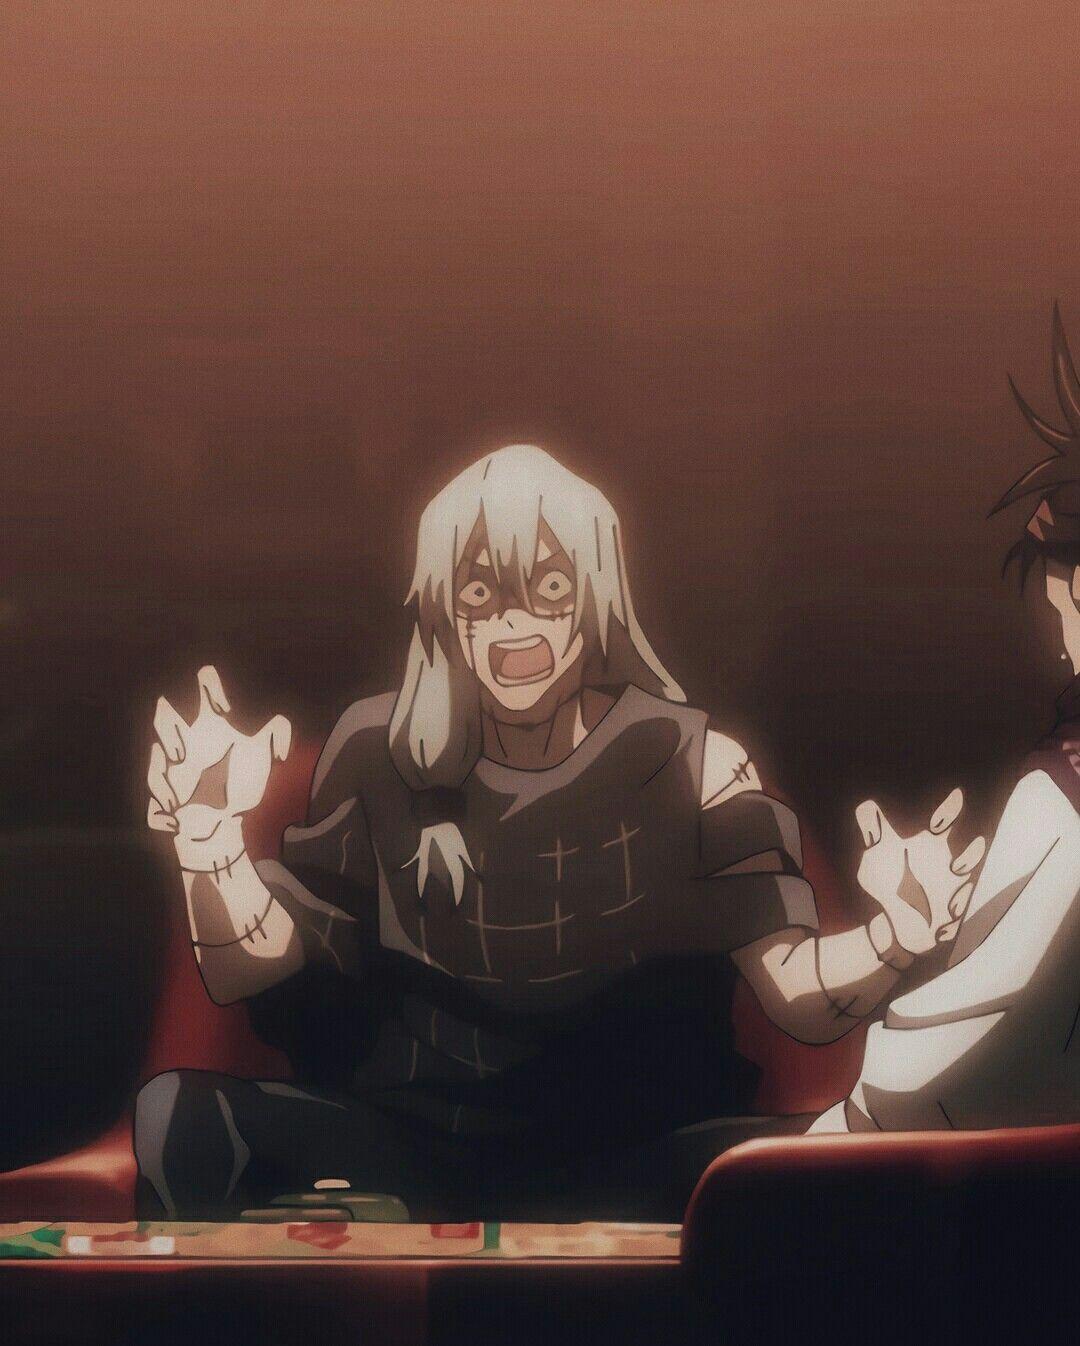 Mahito In 2021 Anime Jujutsu Manga Anime